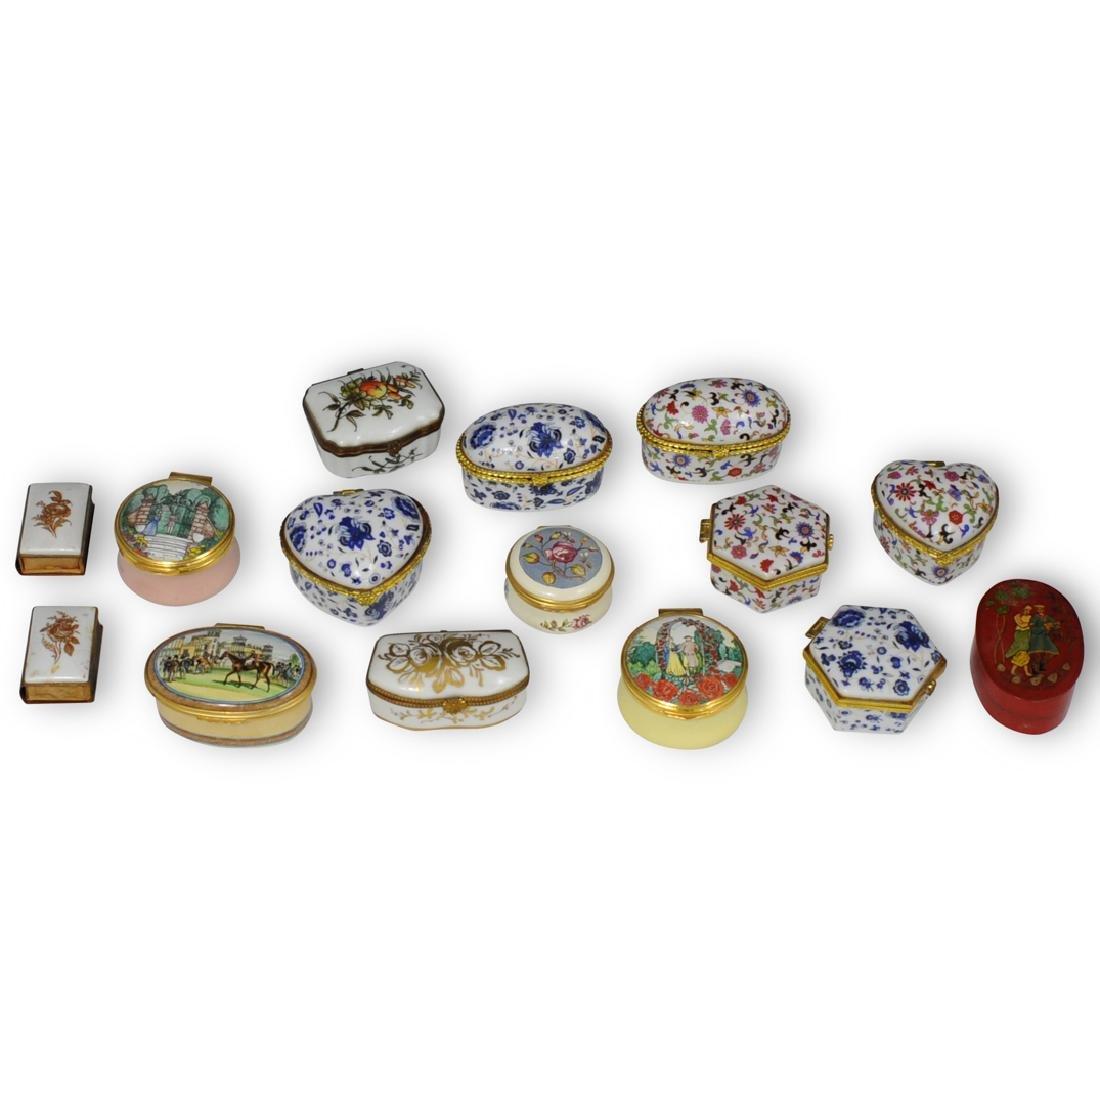 (15 Pc) Continental Porcelain and Enamel Trinket Boxes